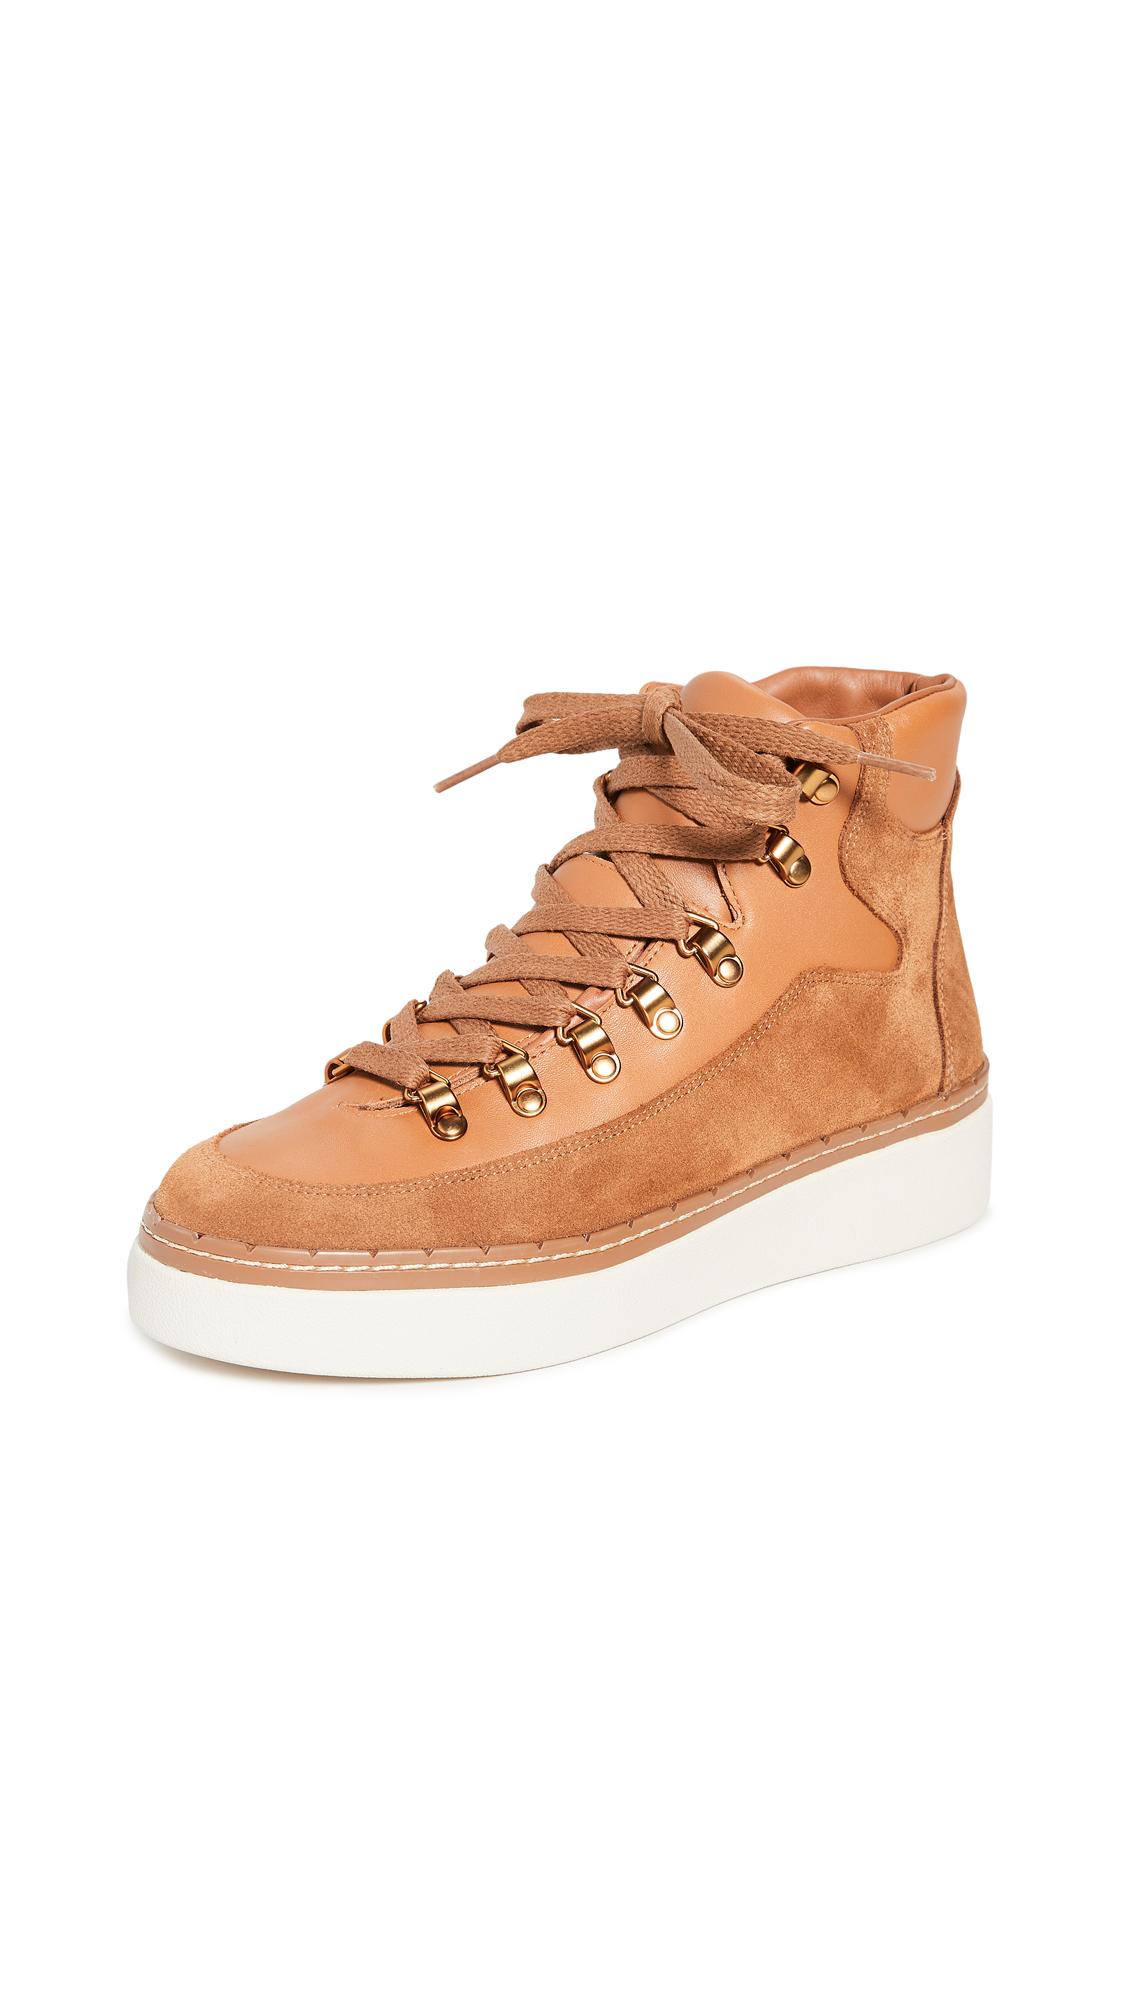 Buy Vince Soren Boots online, shop Vince